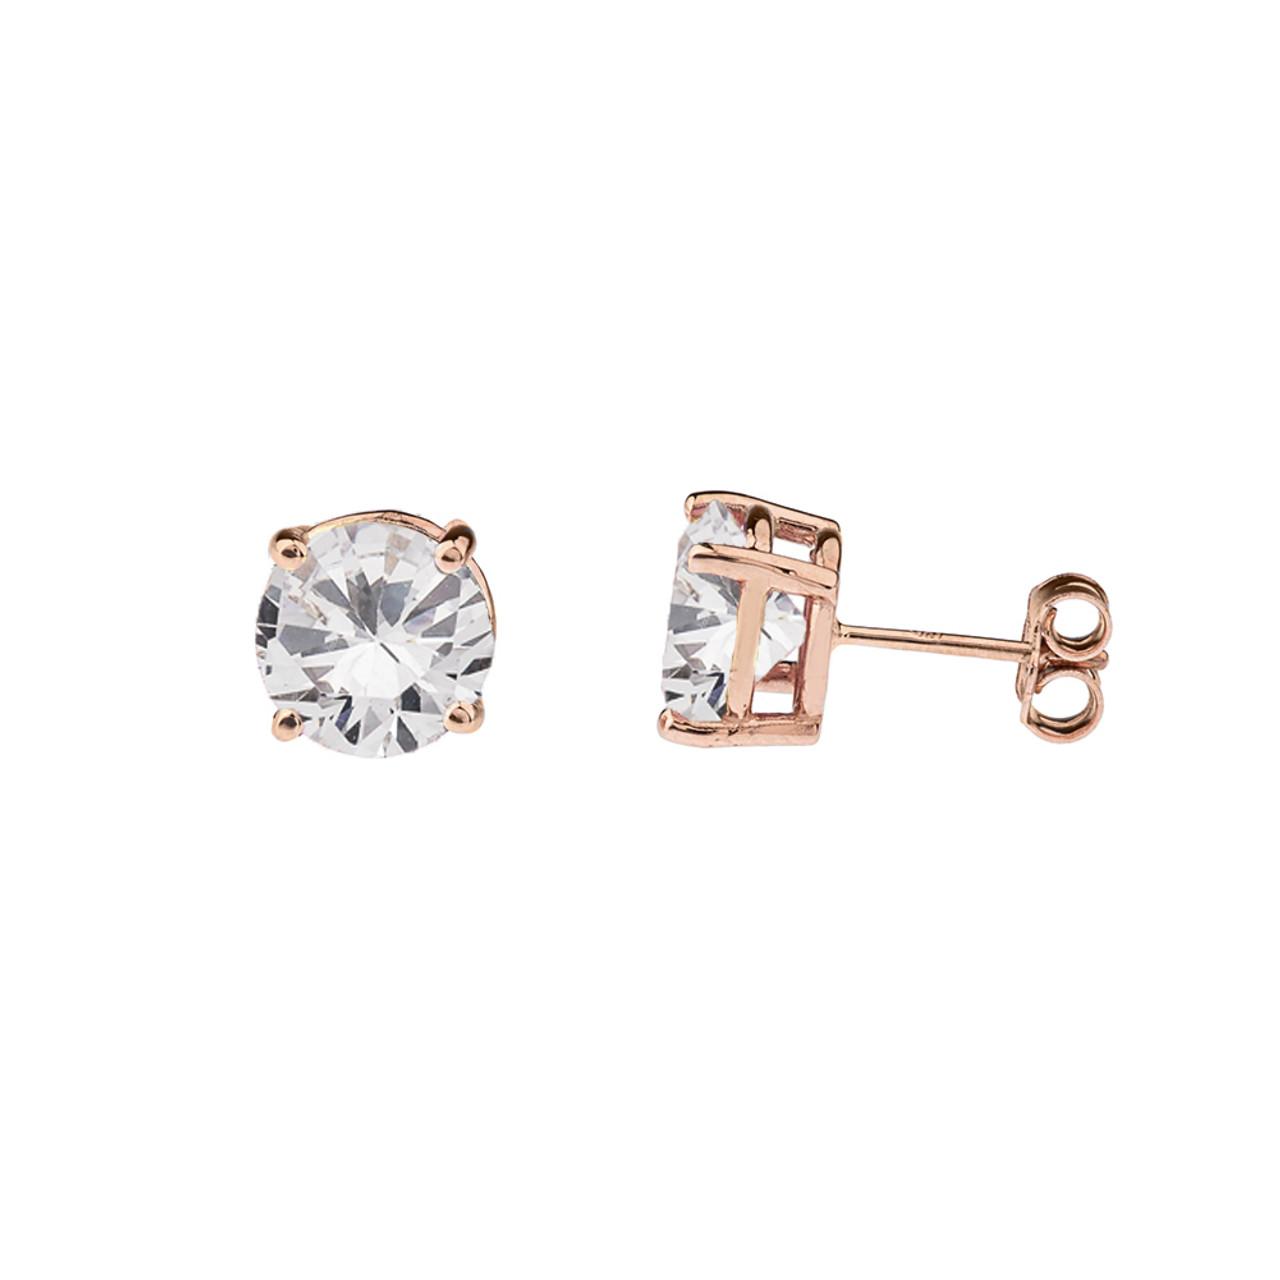 10K Rose Gold April Birthstone Cubic Zirconia (CZ) Earrings d701a82142